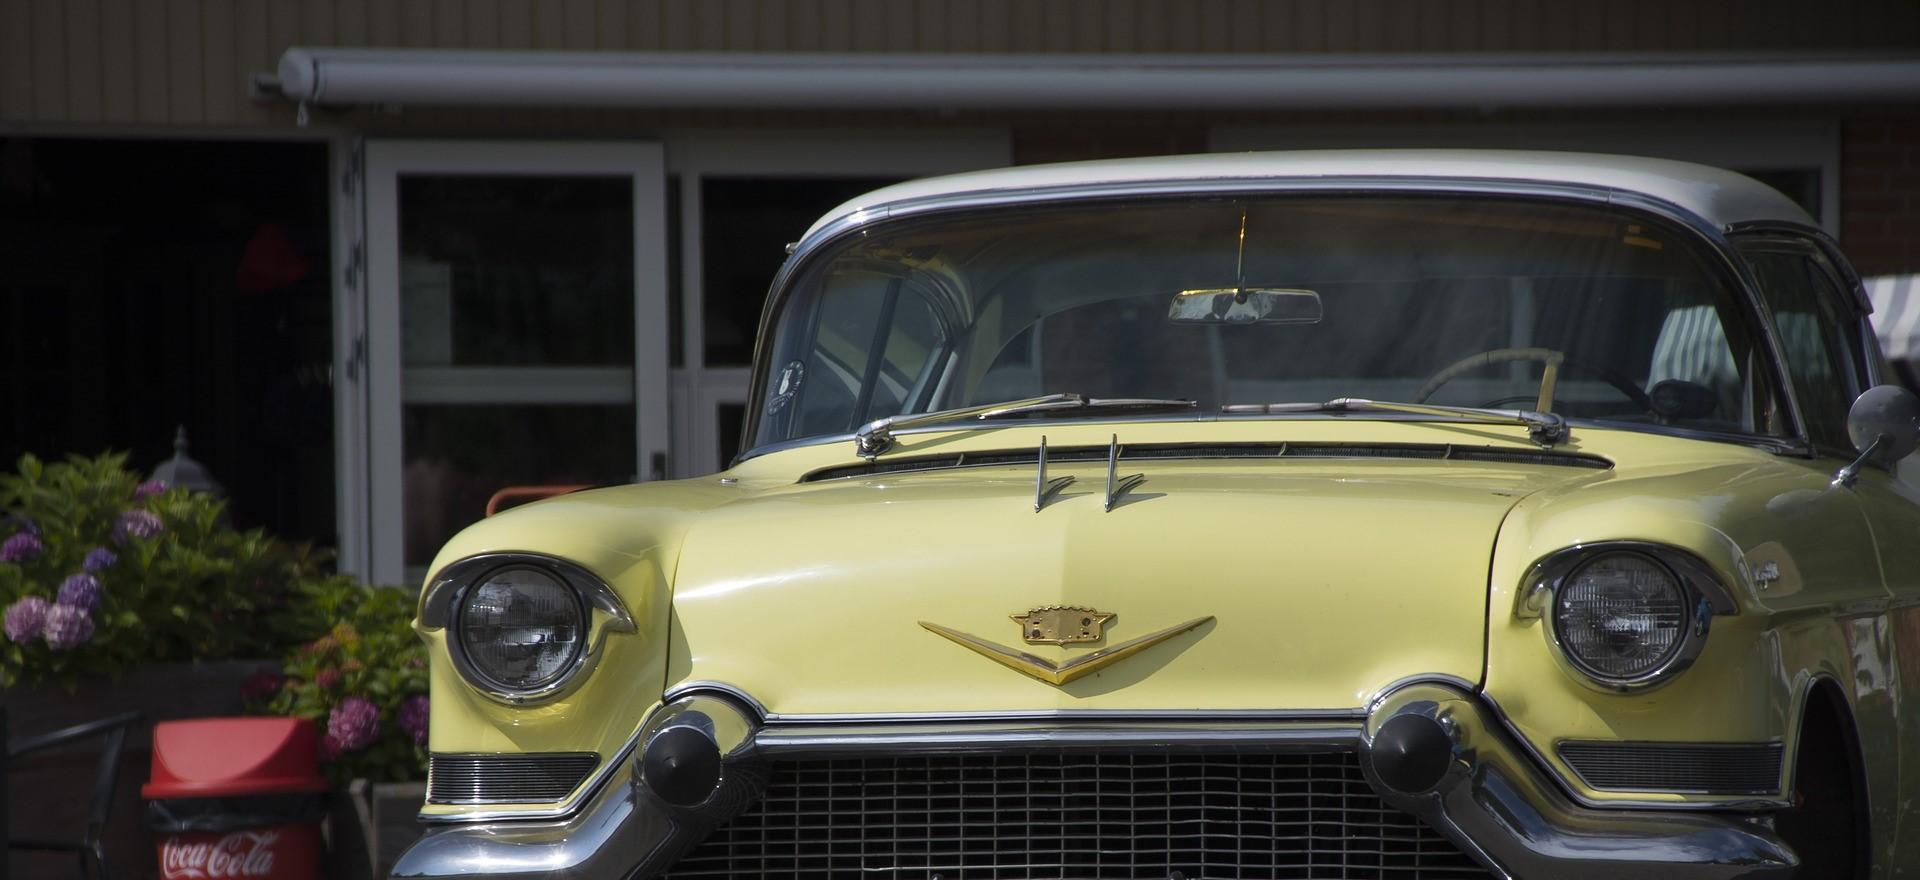 Classic Oldtimer Cadillac in Ardmore, Pennsylvania - VeteranCarDonations.org